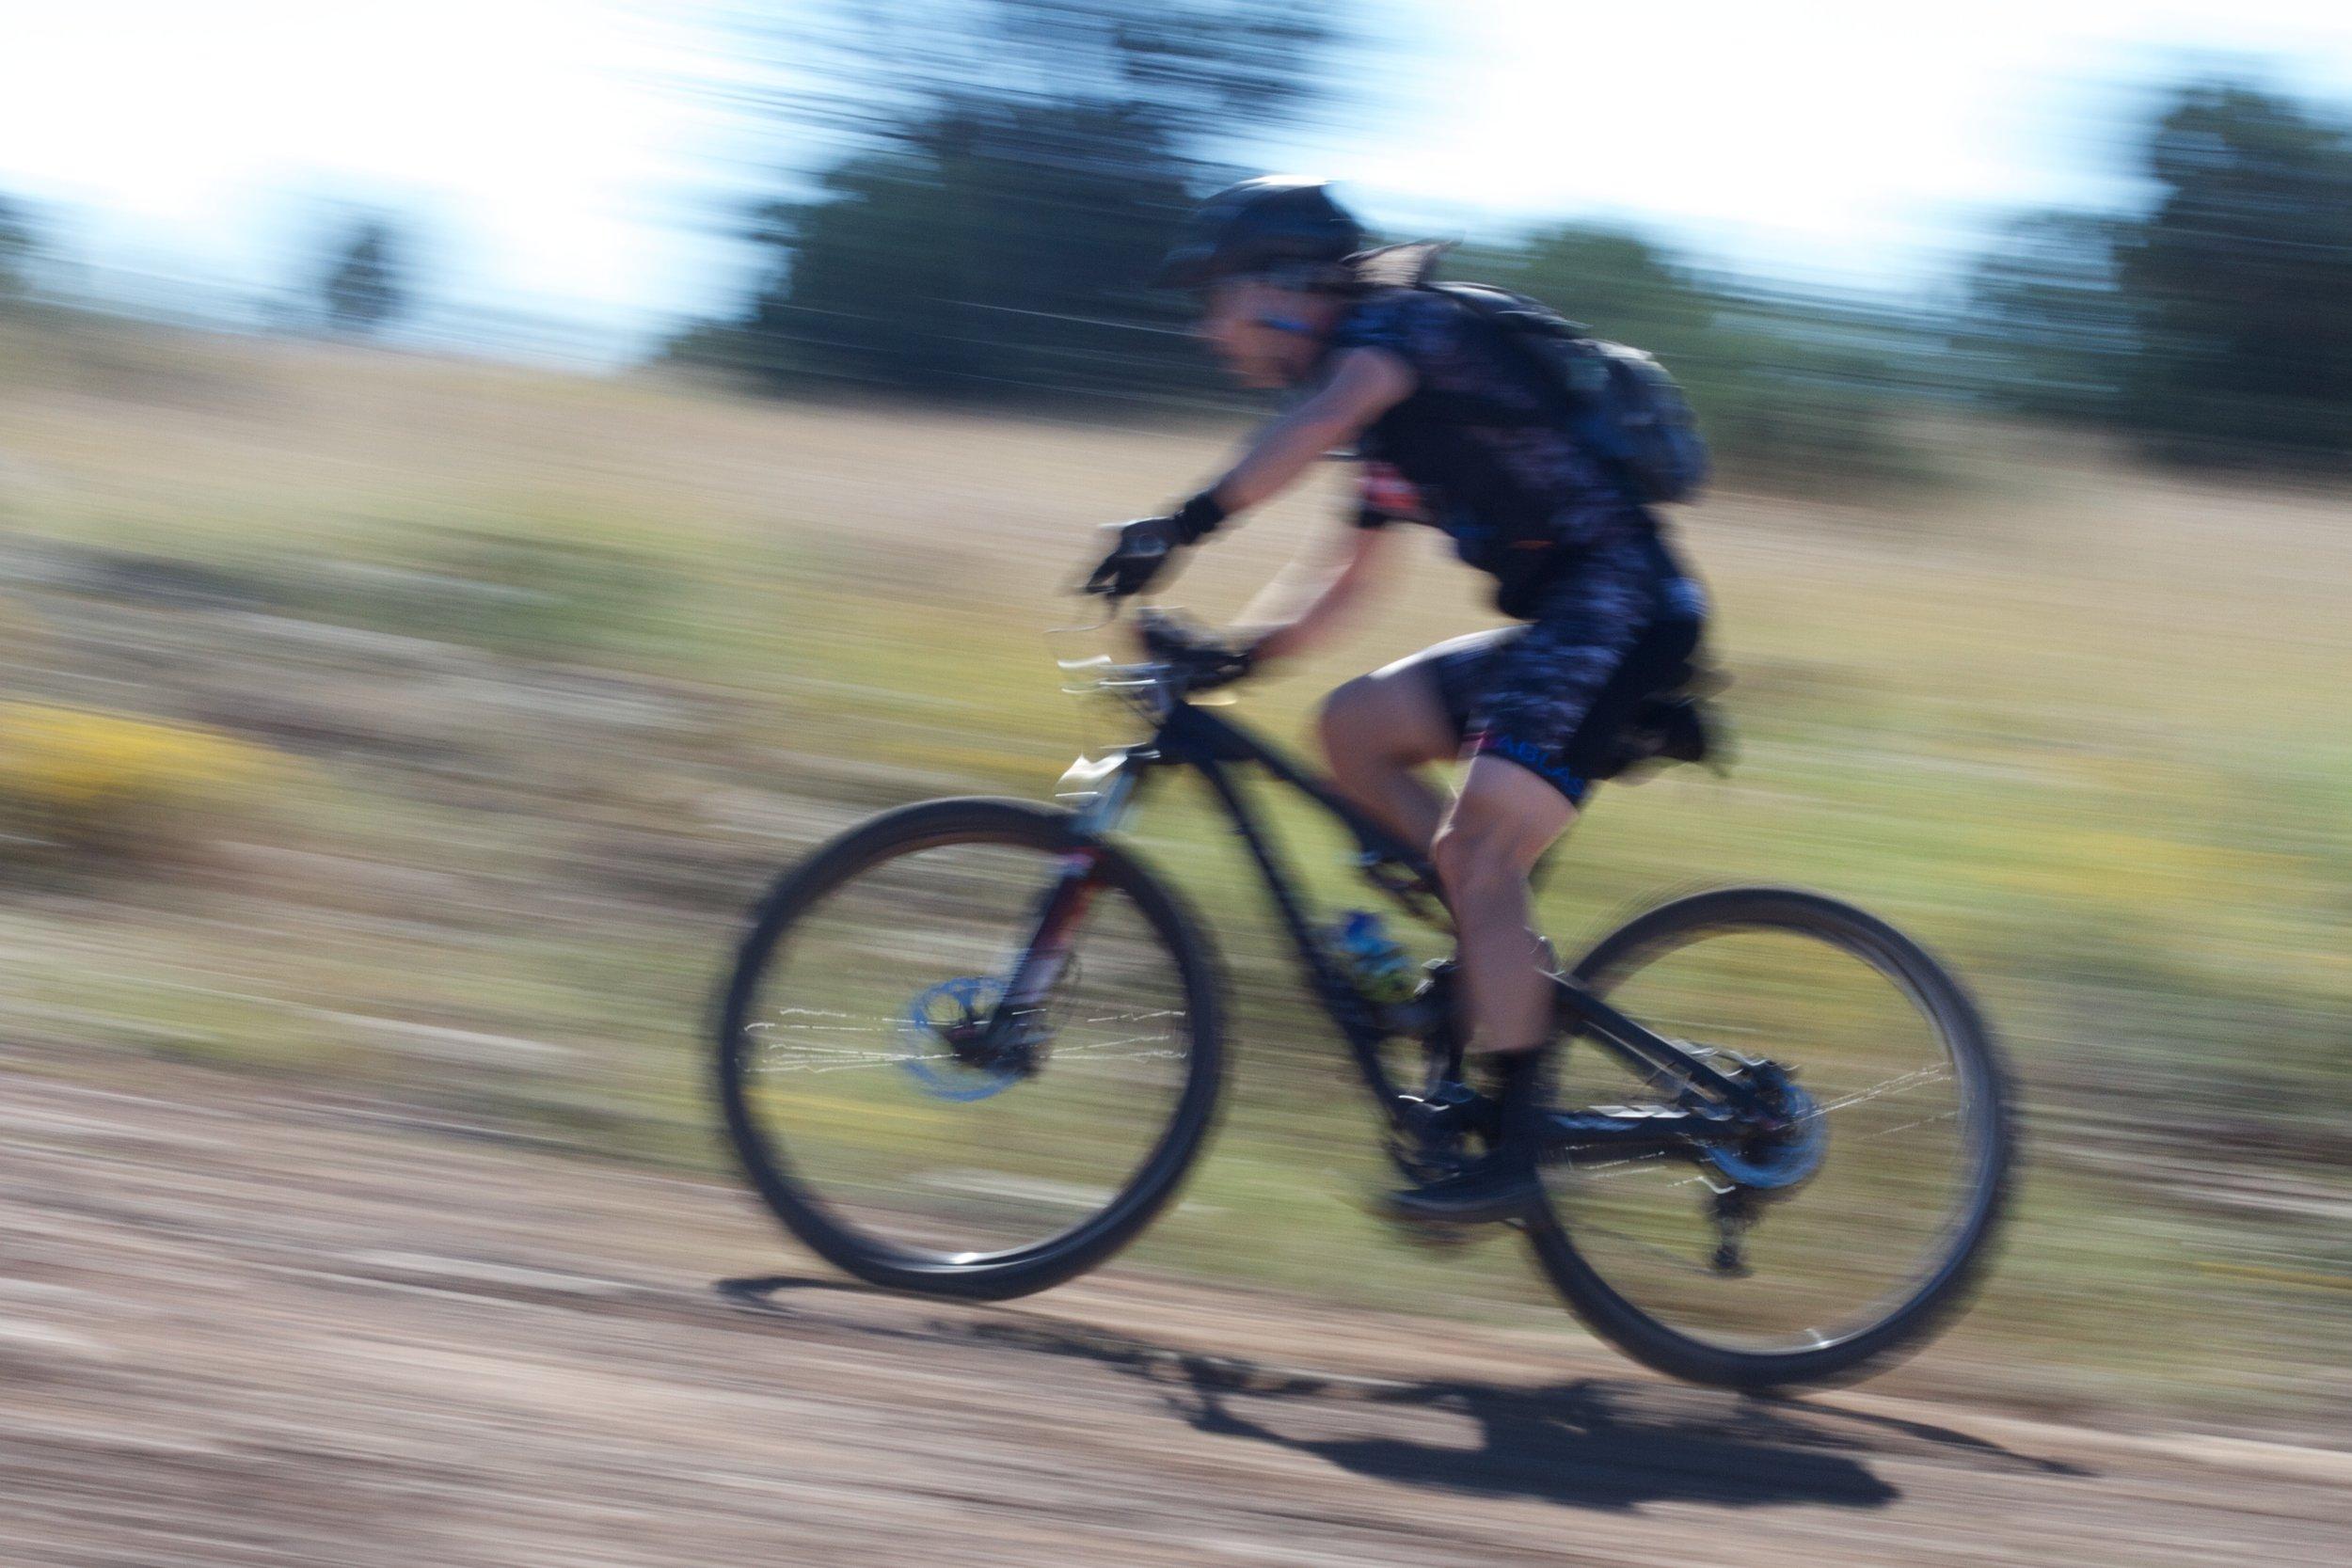 bicycle-recreation-vehicle-sports-equipment-mountain-bike-cycling-193988-pxhere.com.jpg